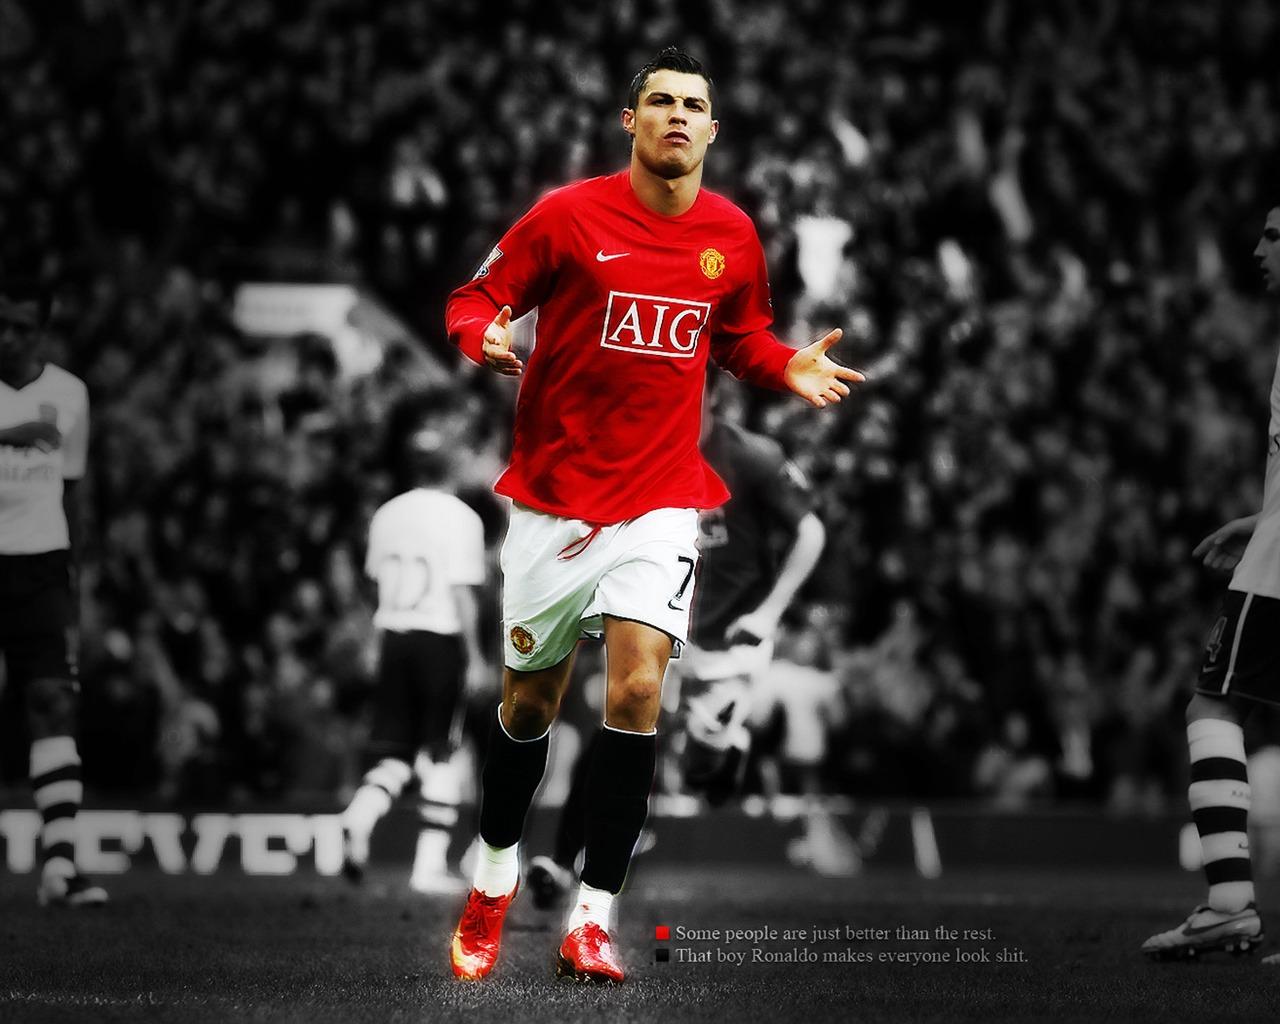 Football Cristiano Ronaldo Wallpaper 1280x1024